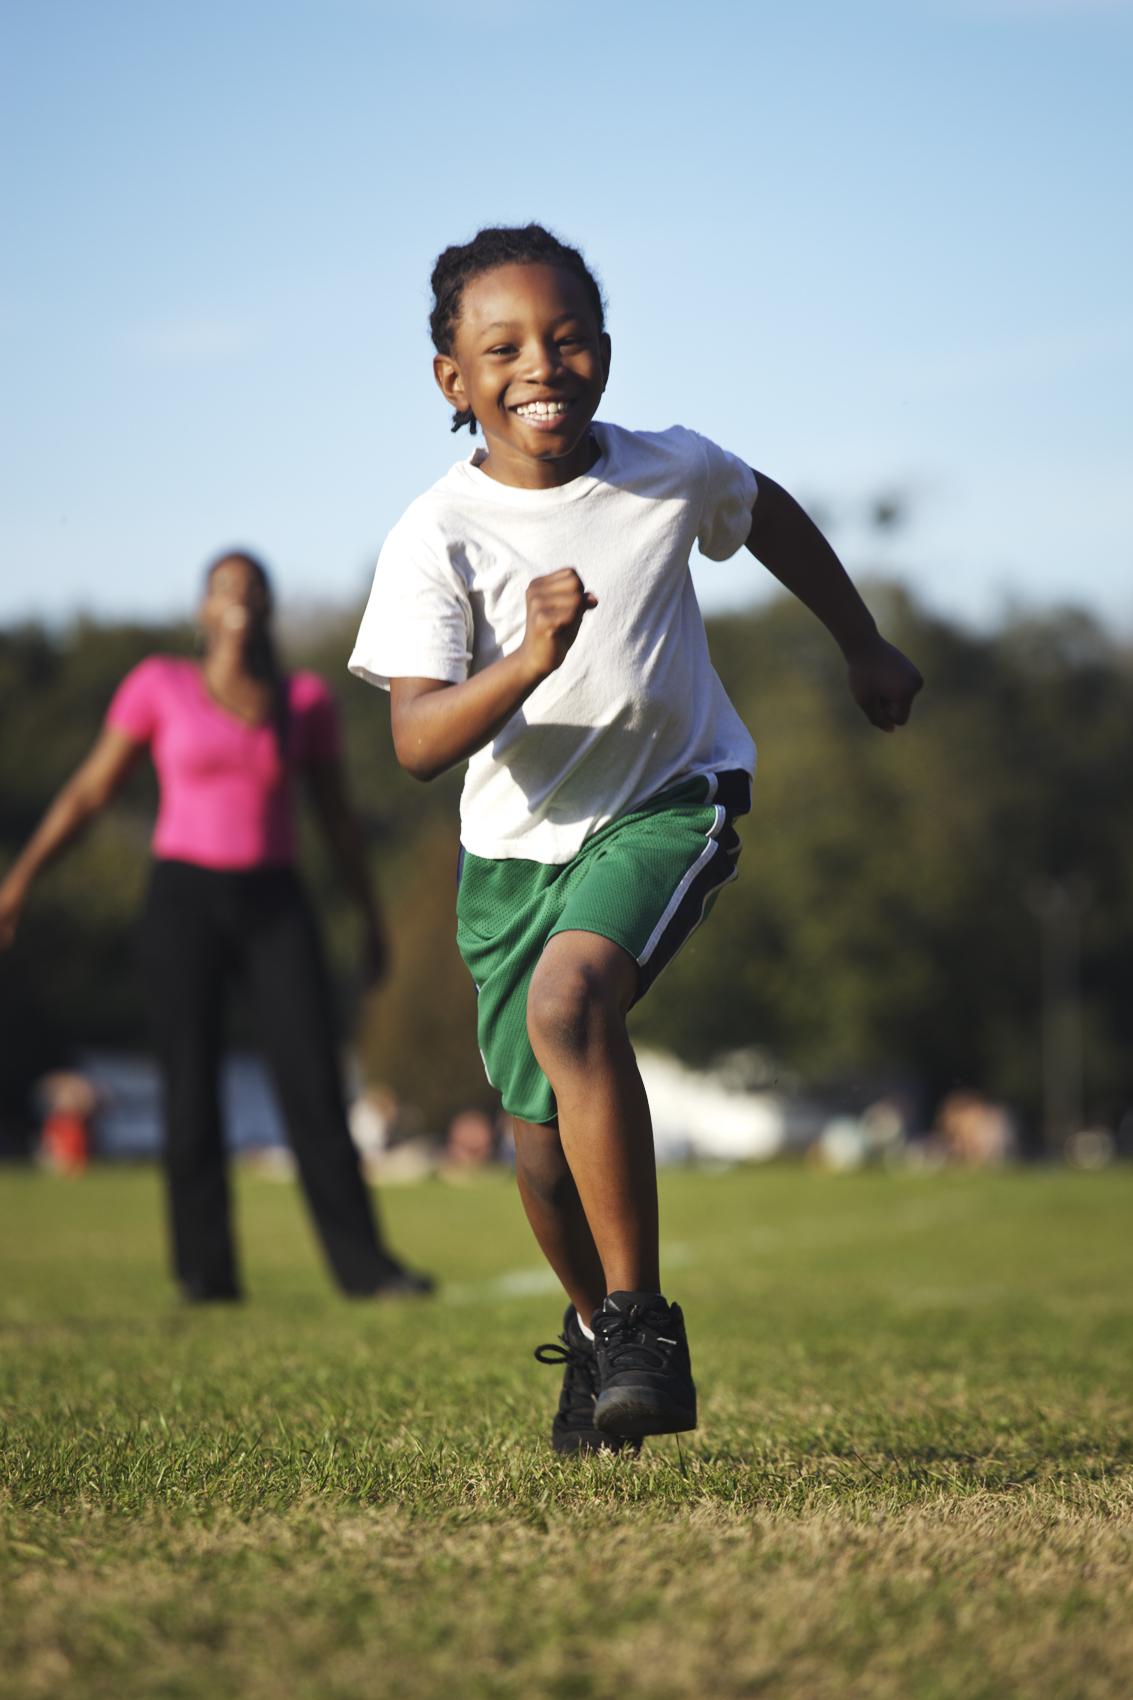 Boy Running and Having Fun